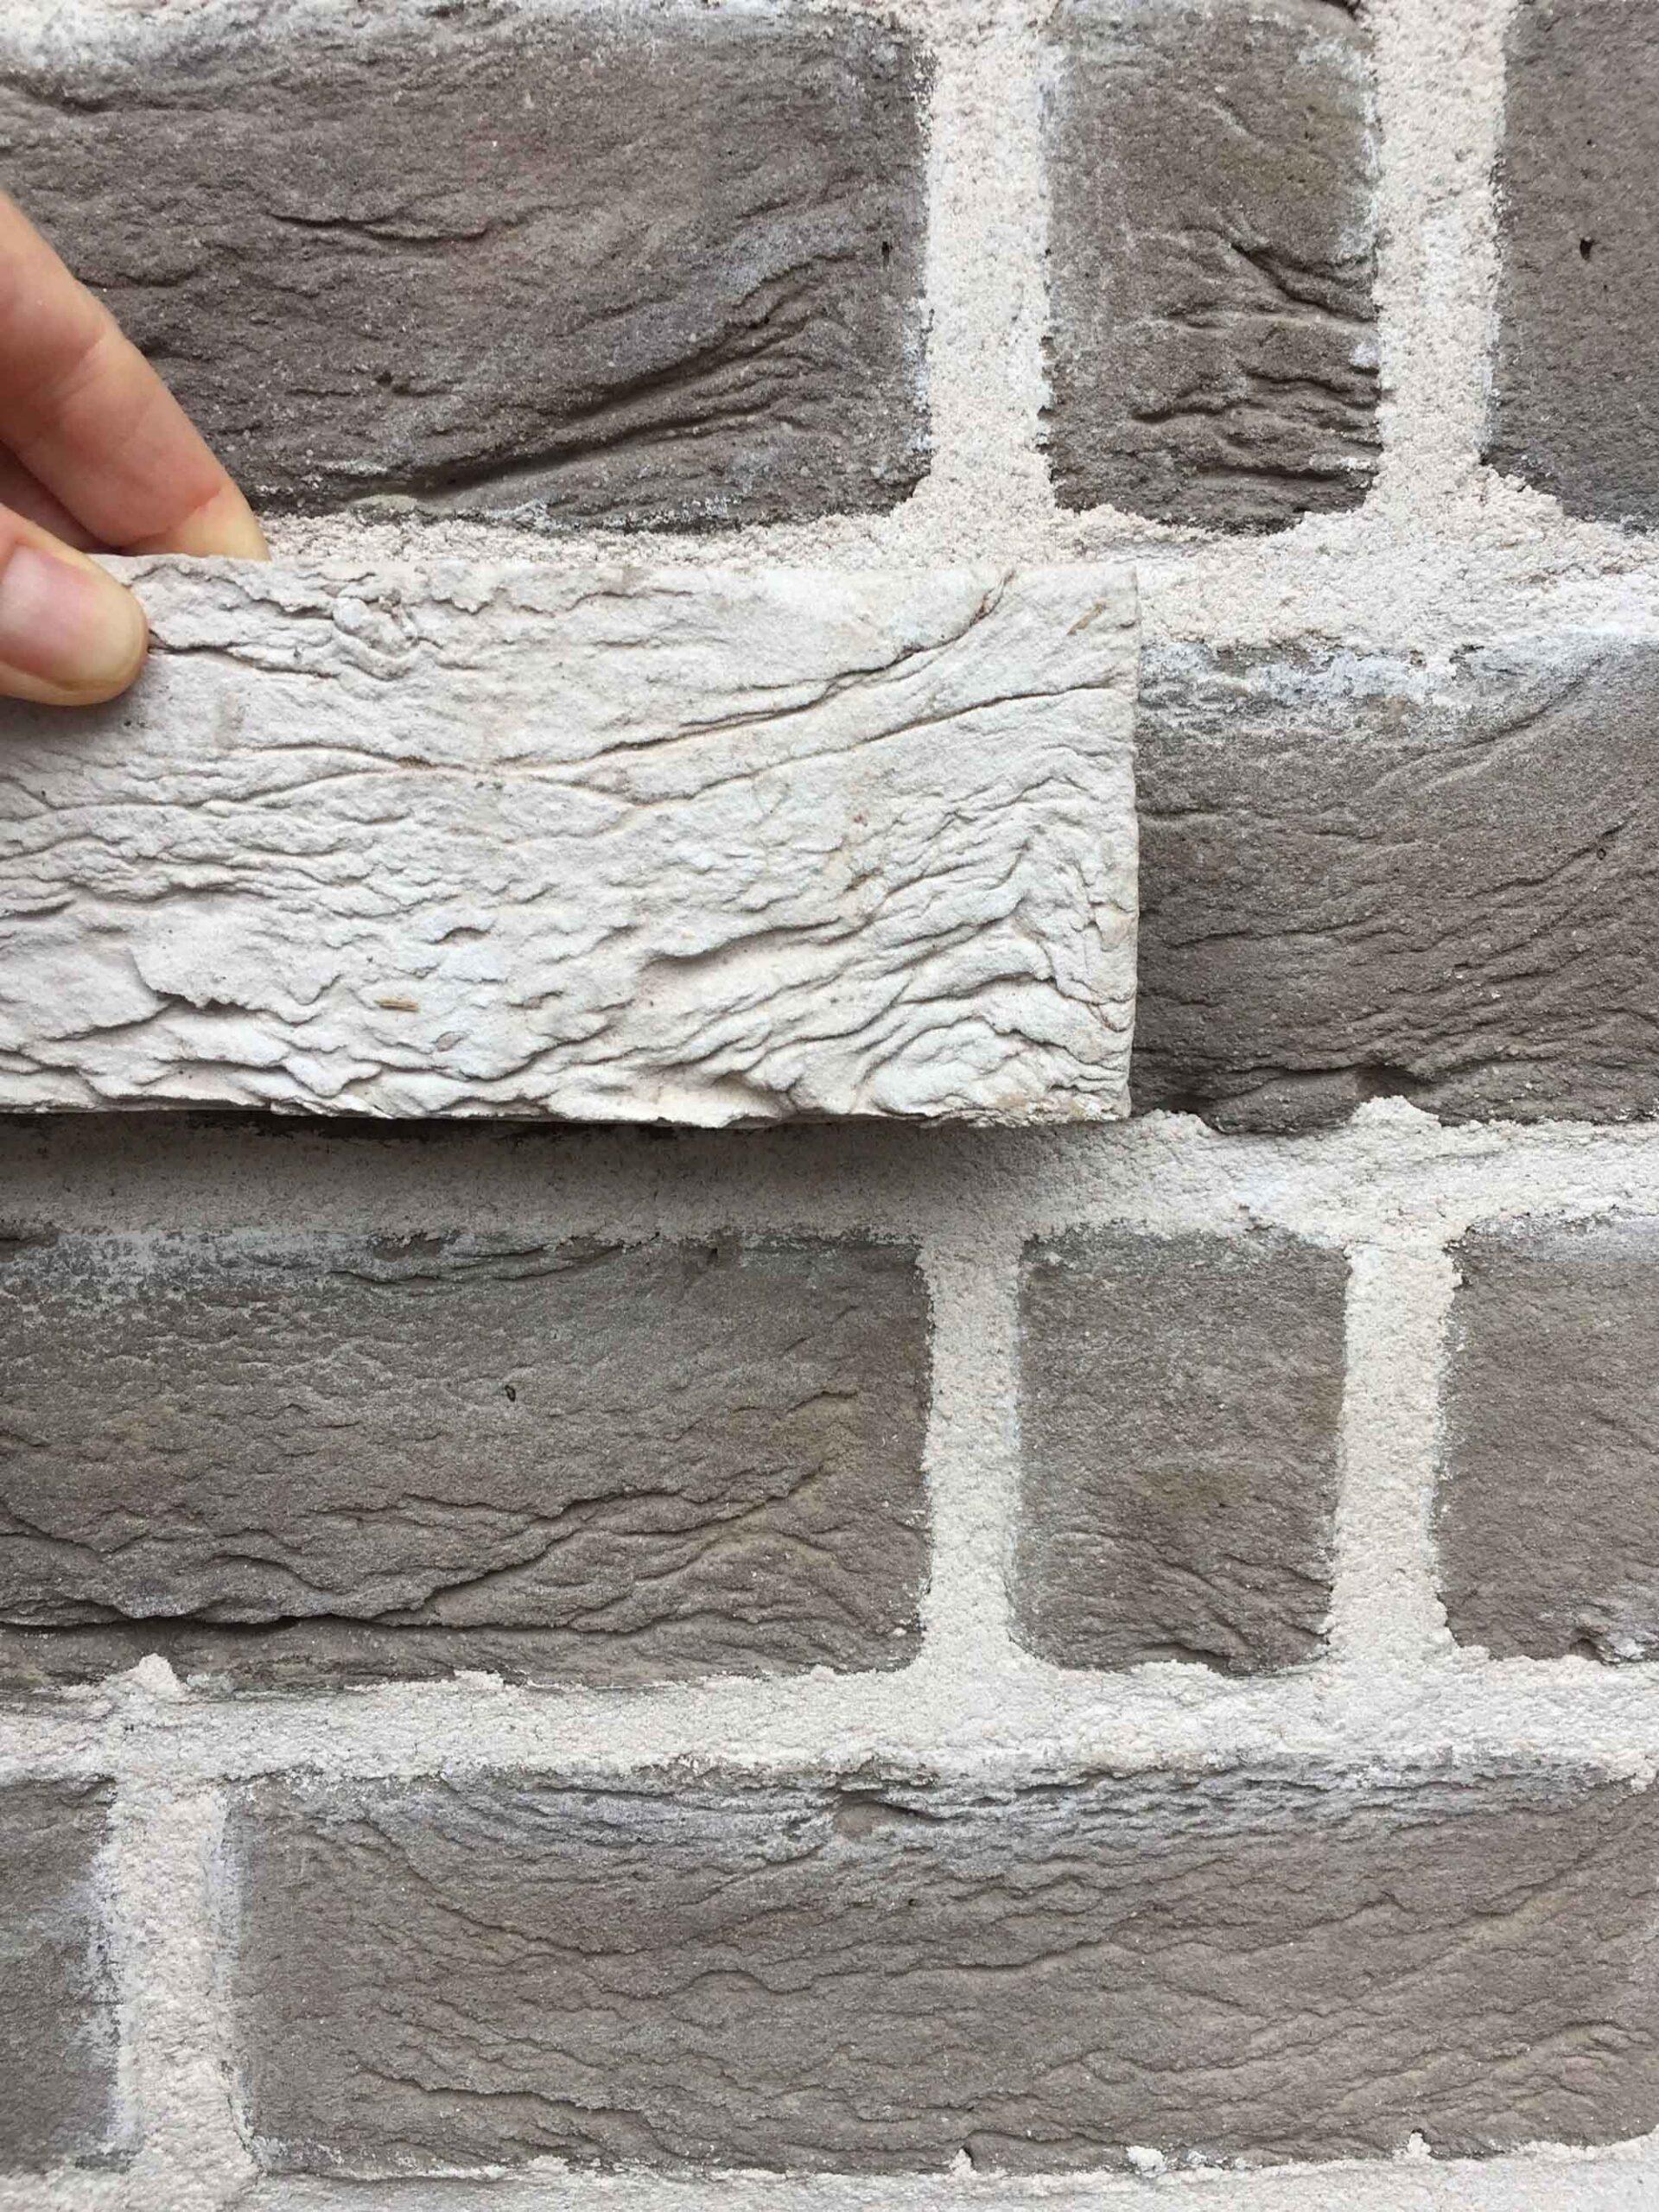 kensington-house-openstudio-architects-brick-wall-mockup